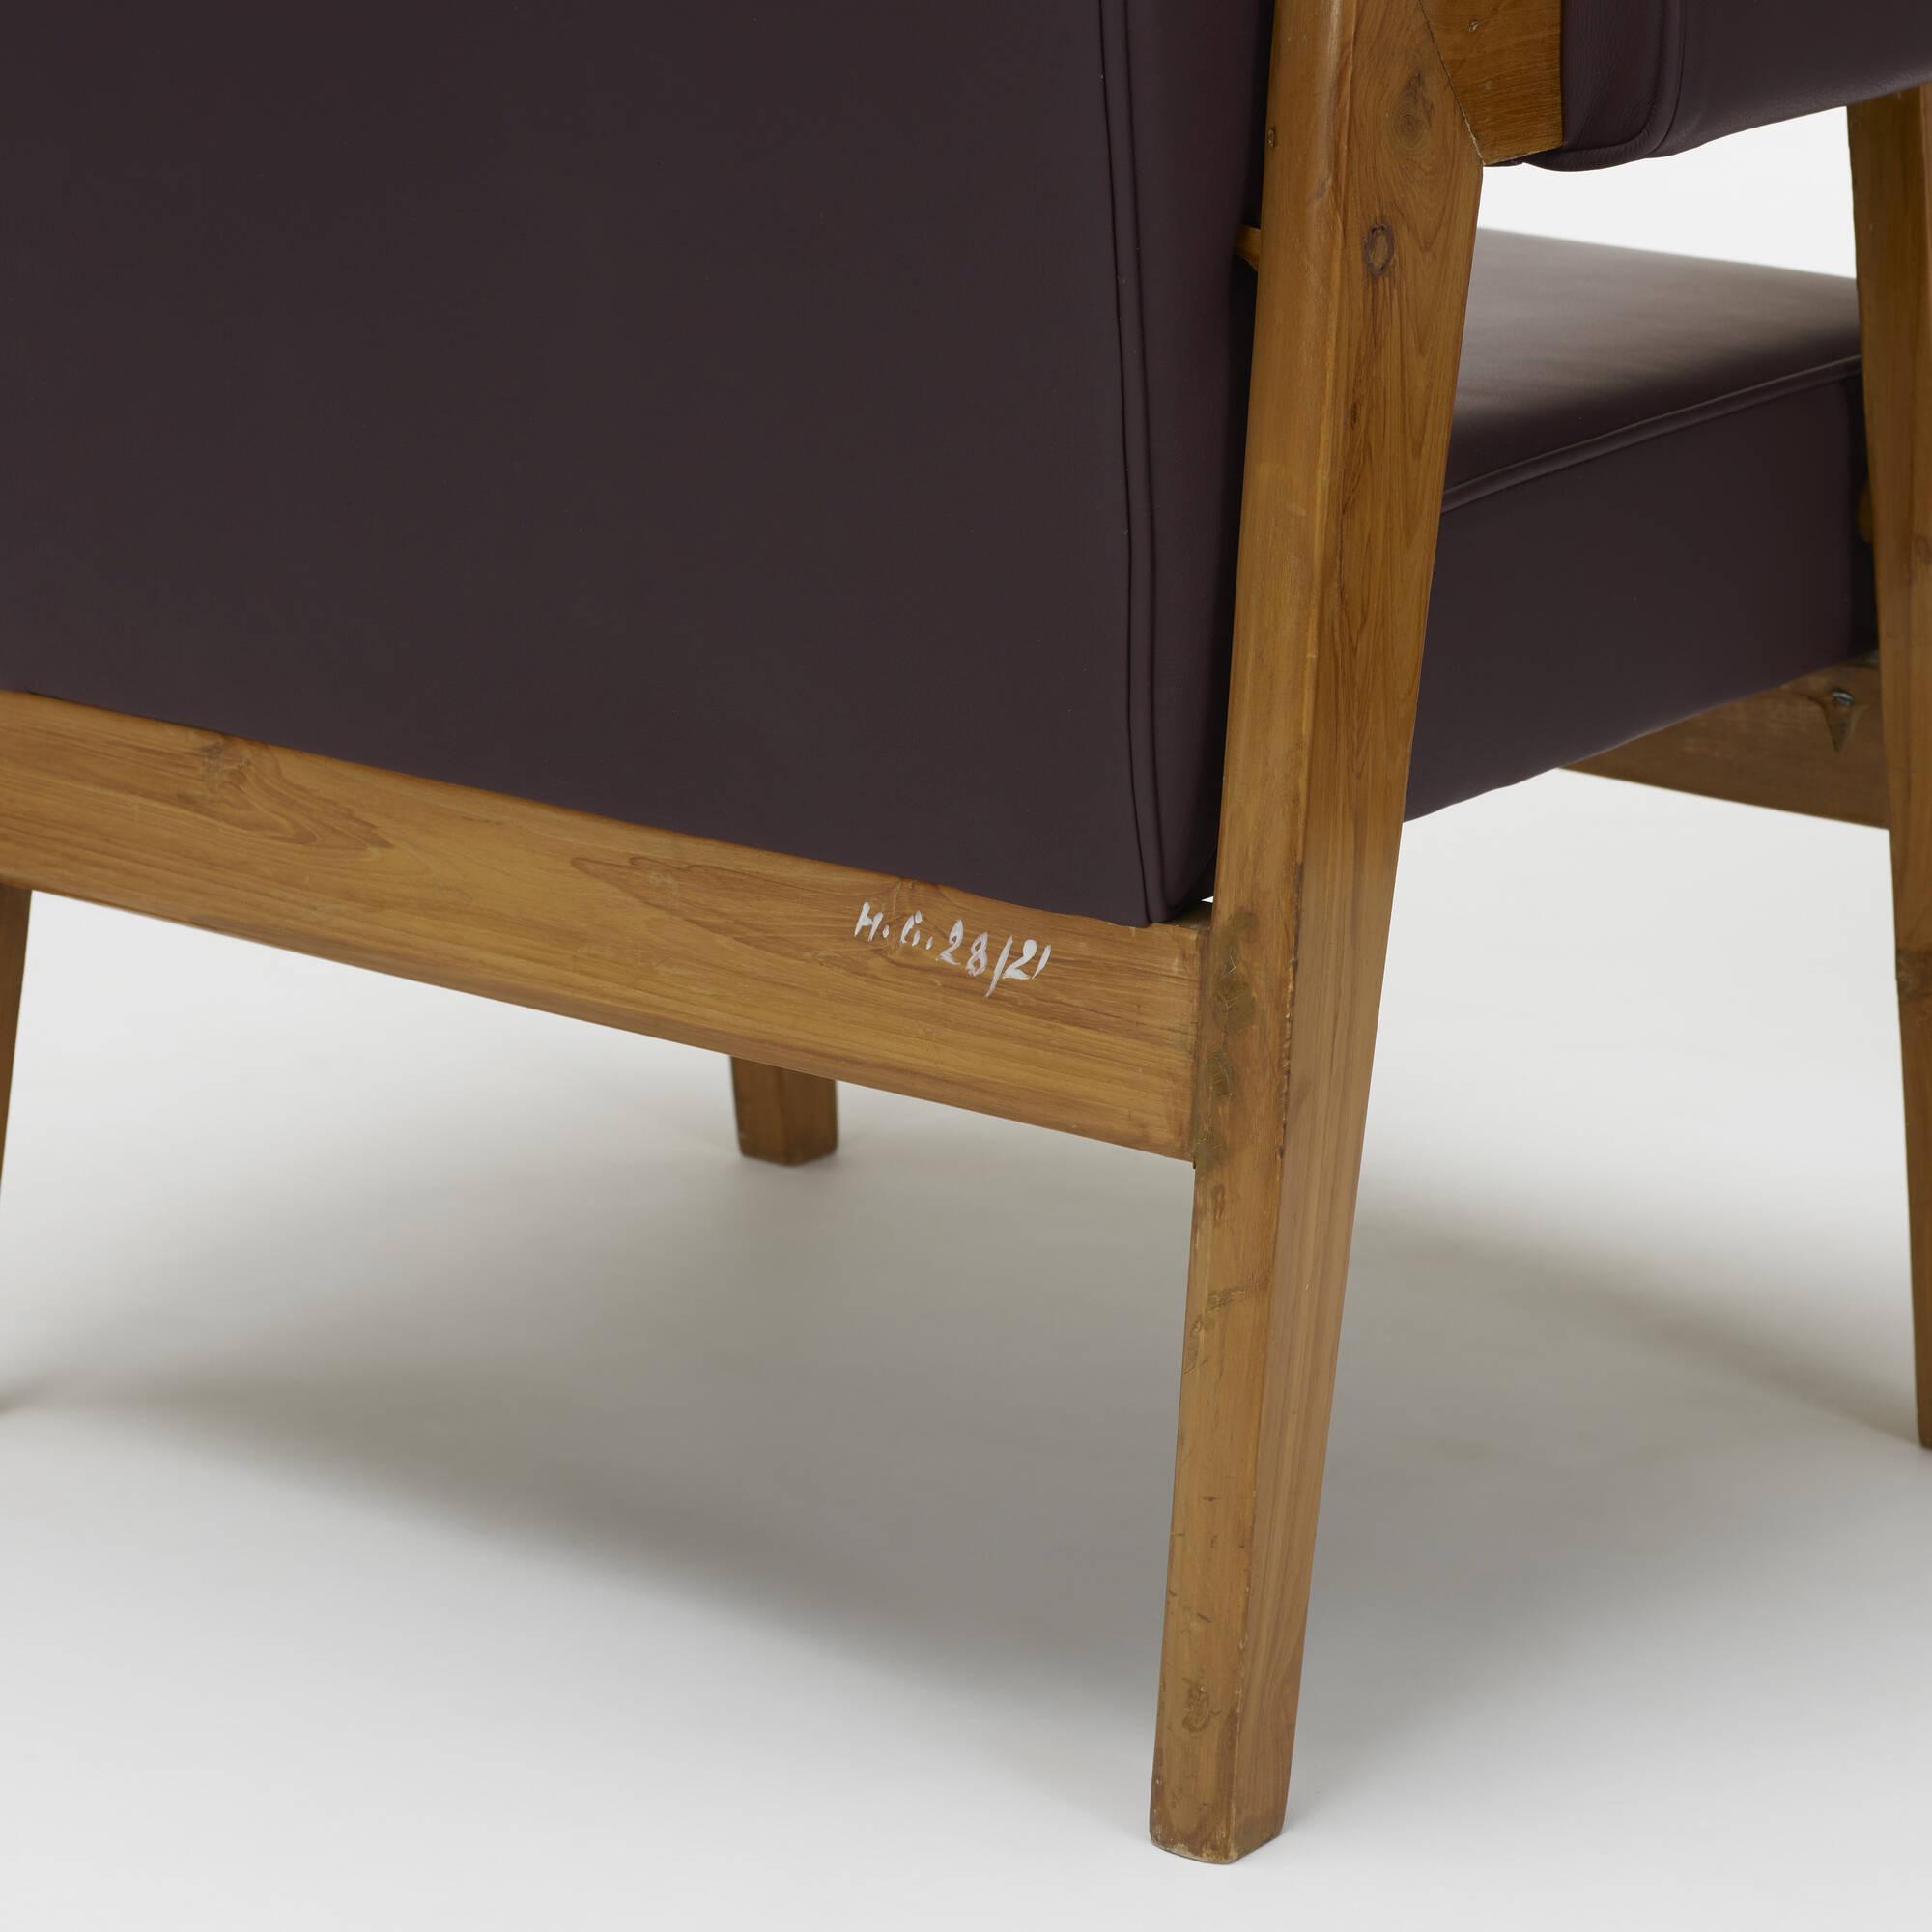 349 Le Corbusier and Pierre Jeanneret pair of Bridge armchairs